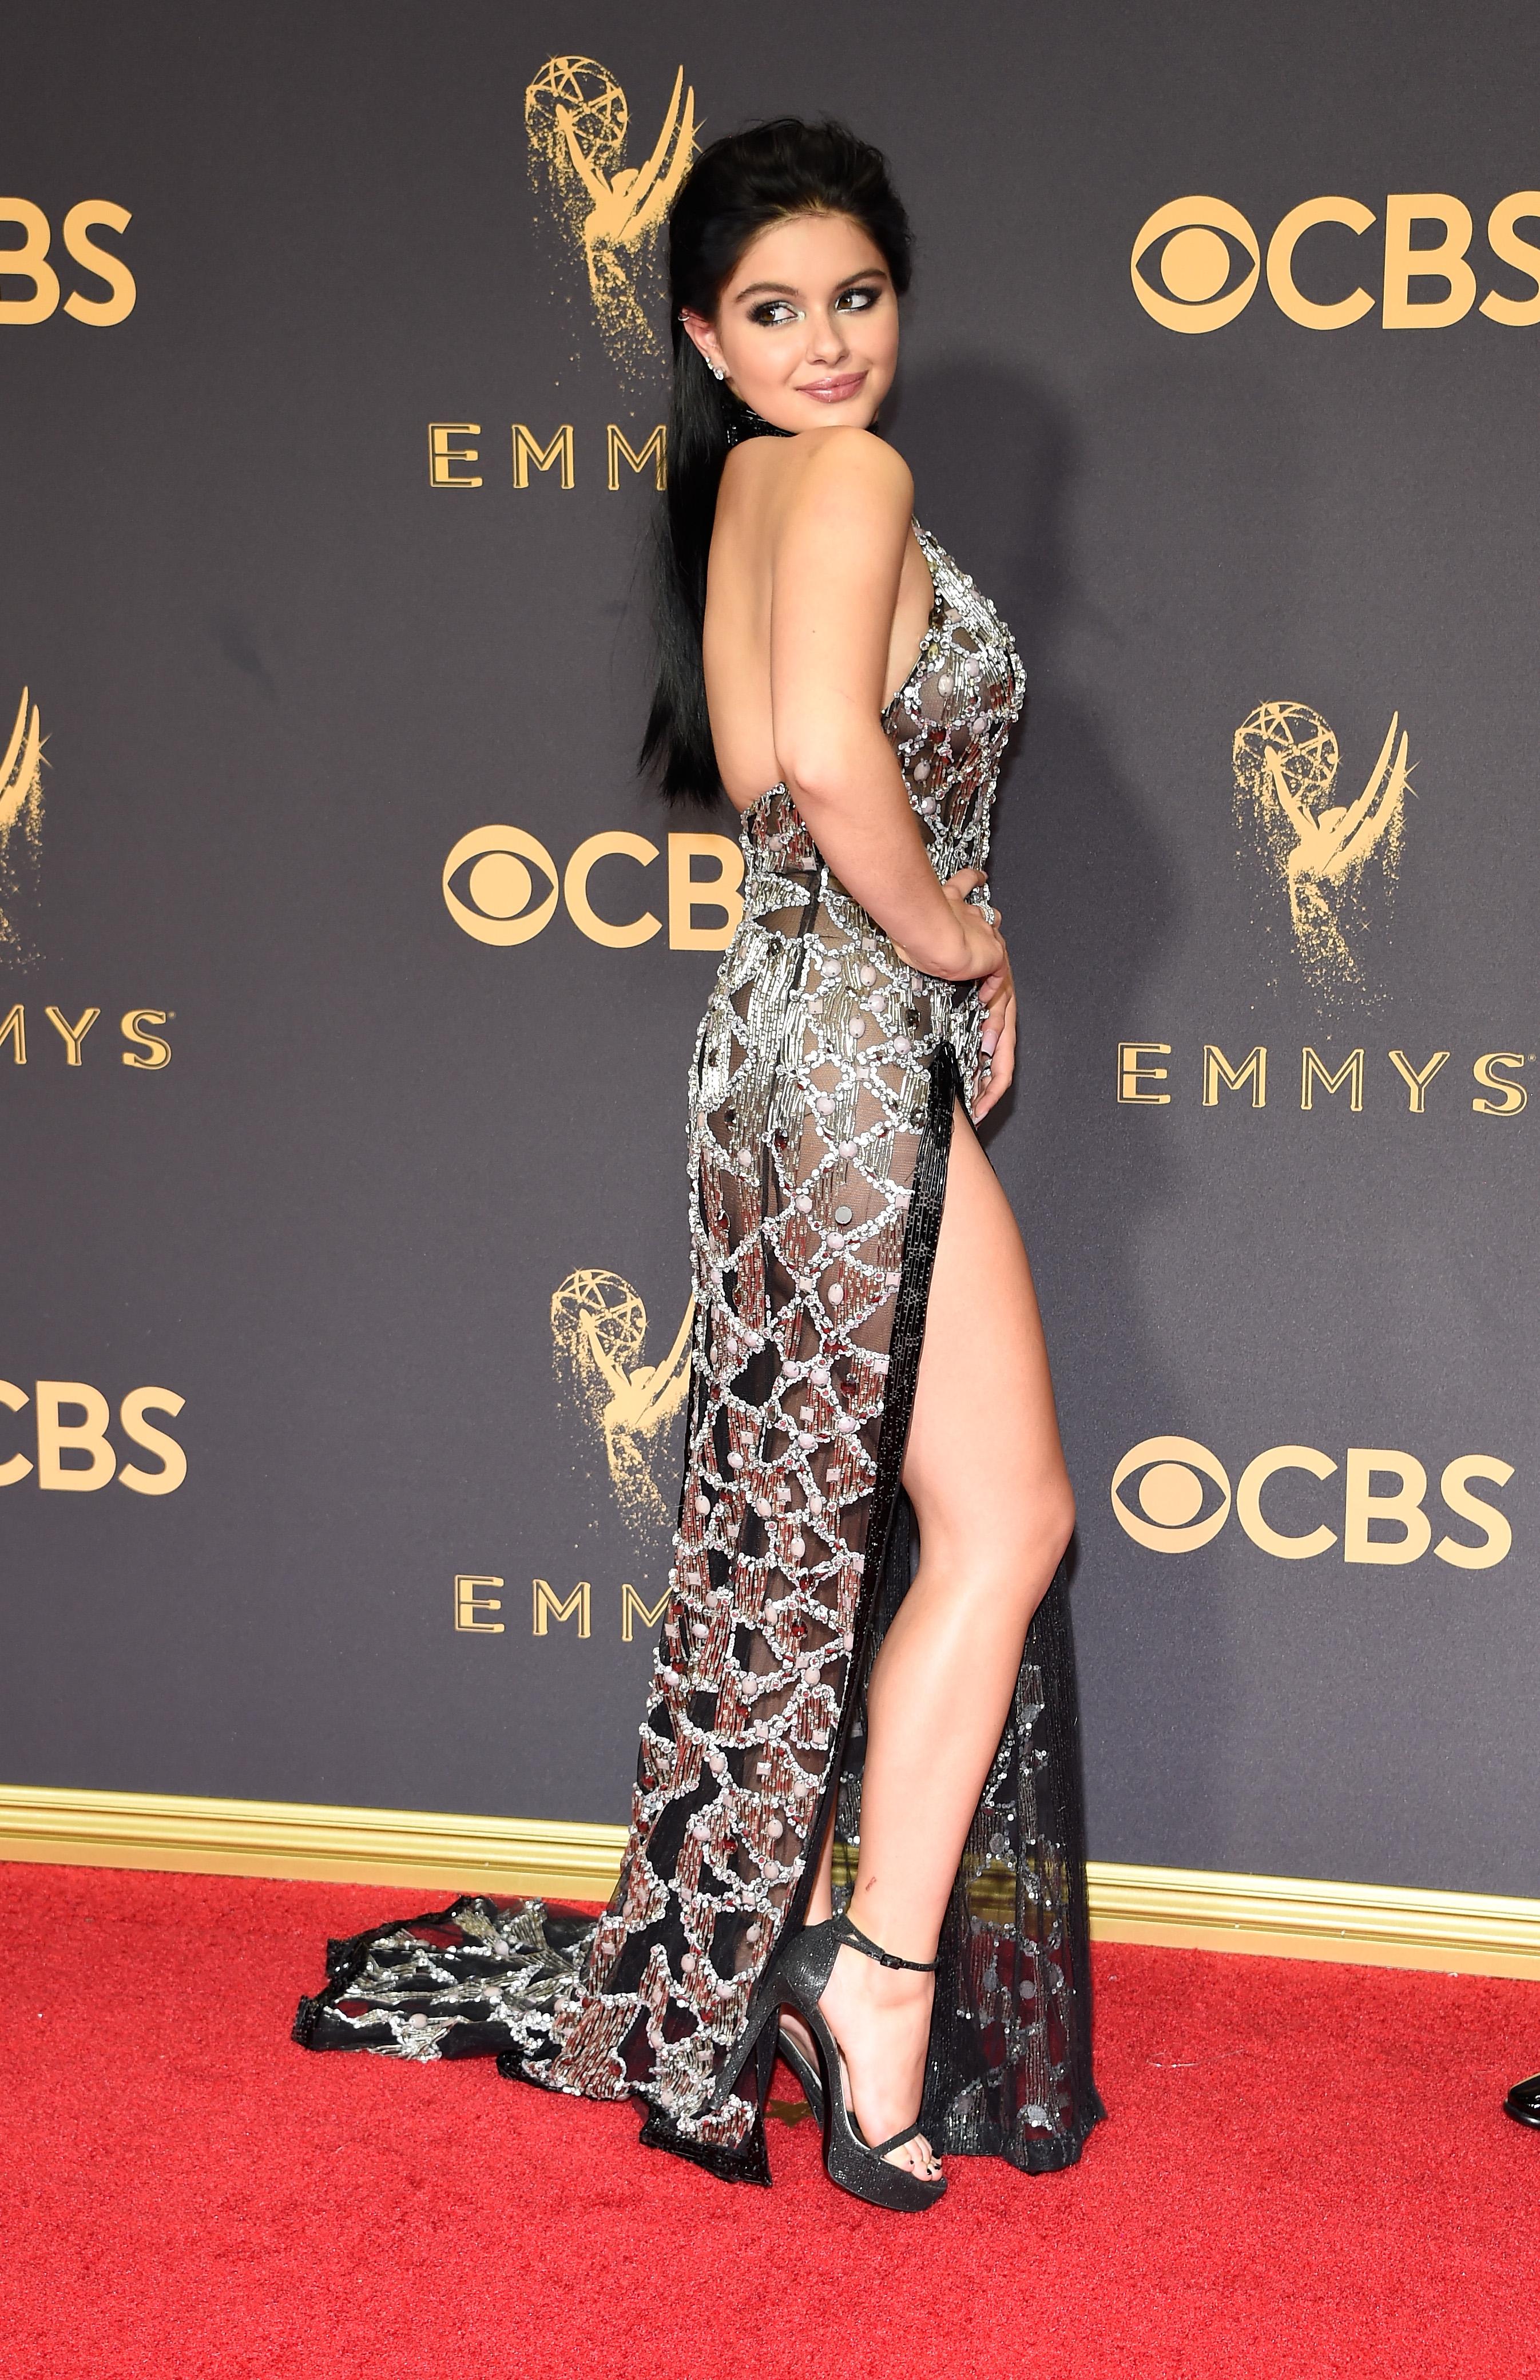 Ariel Winter Rocks Leggy Dress At The 2017 Emmy Awards